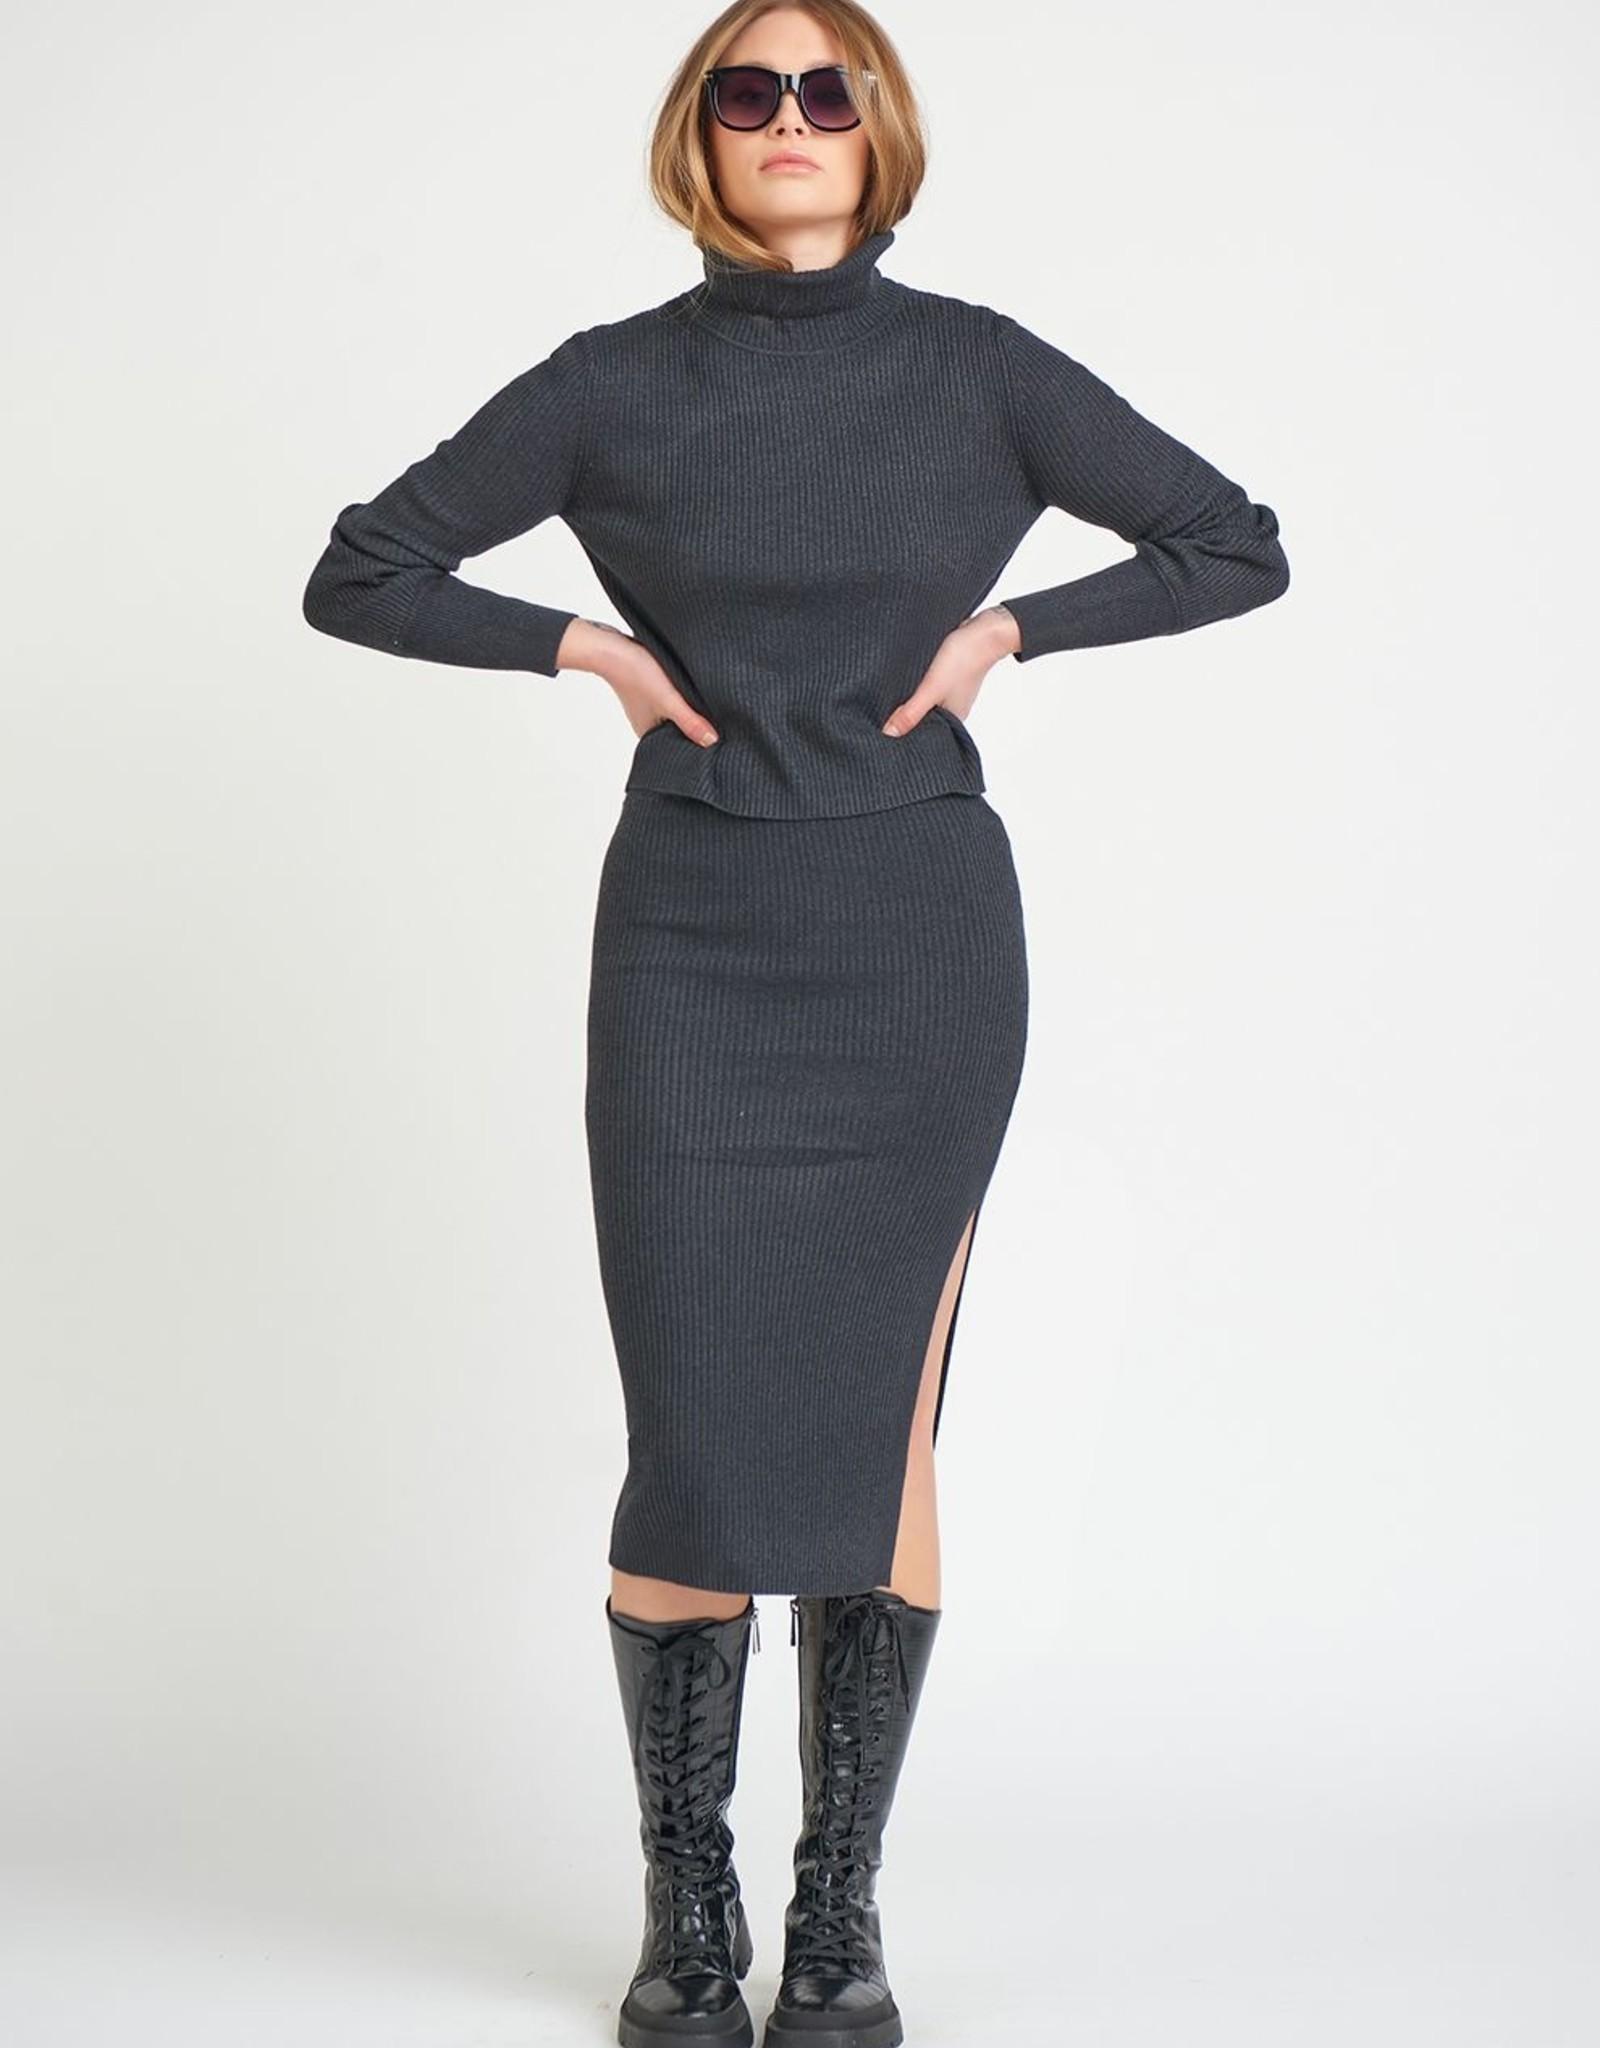 Dex Charcoal Knit Skirt